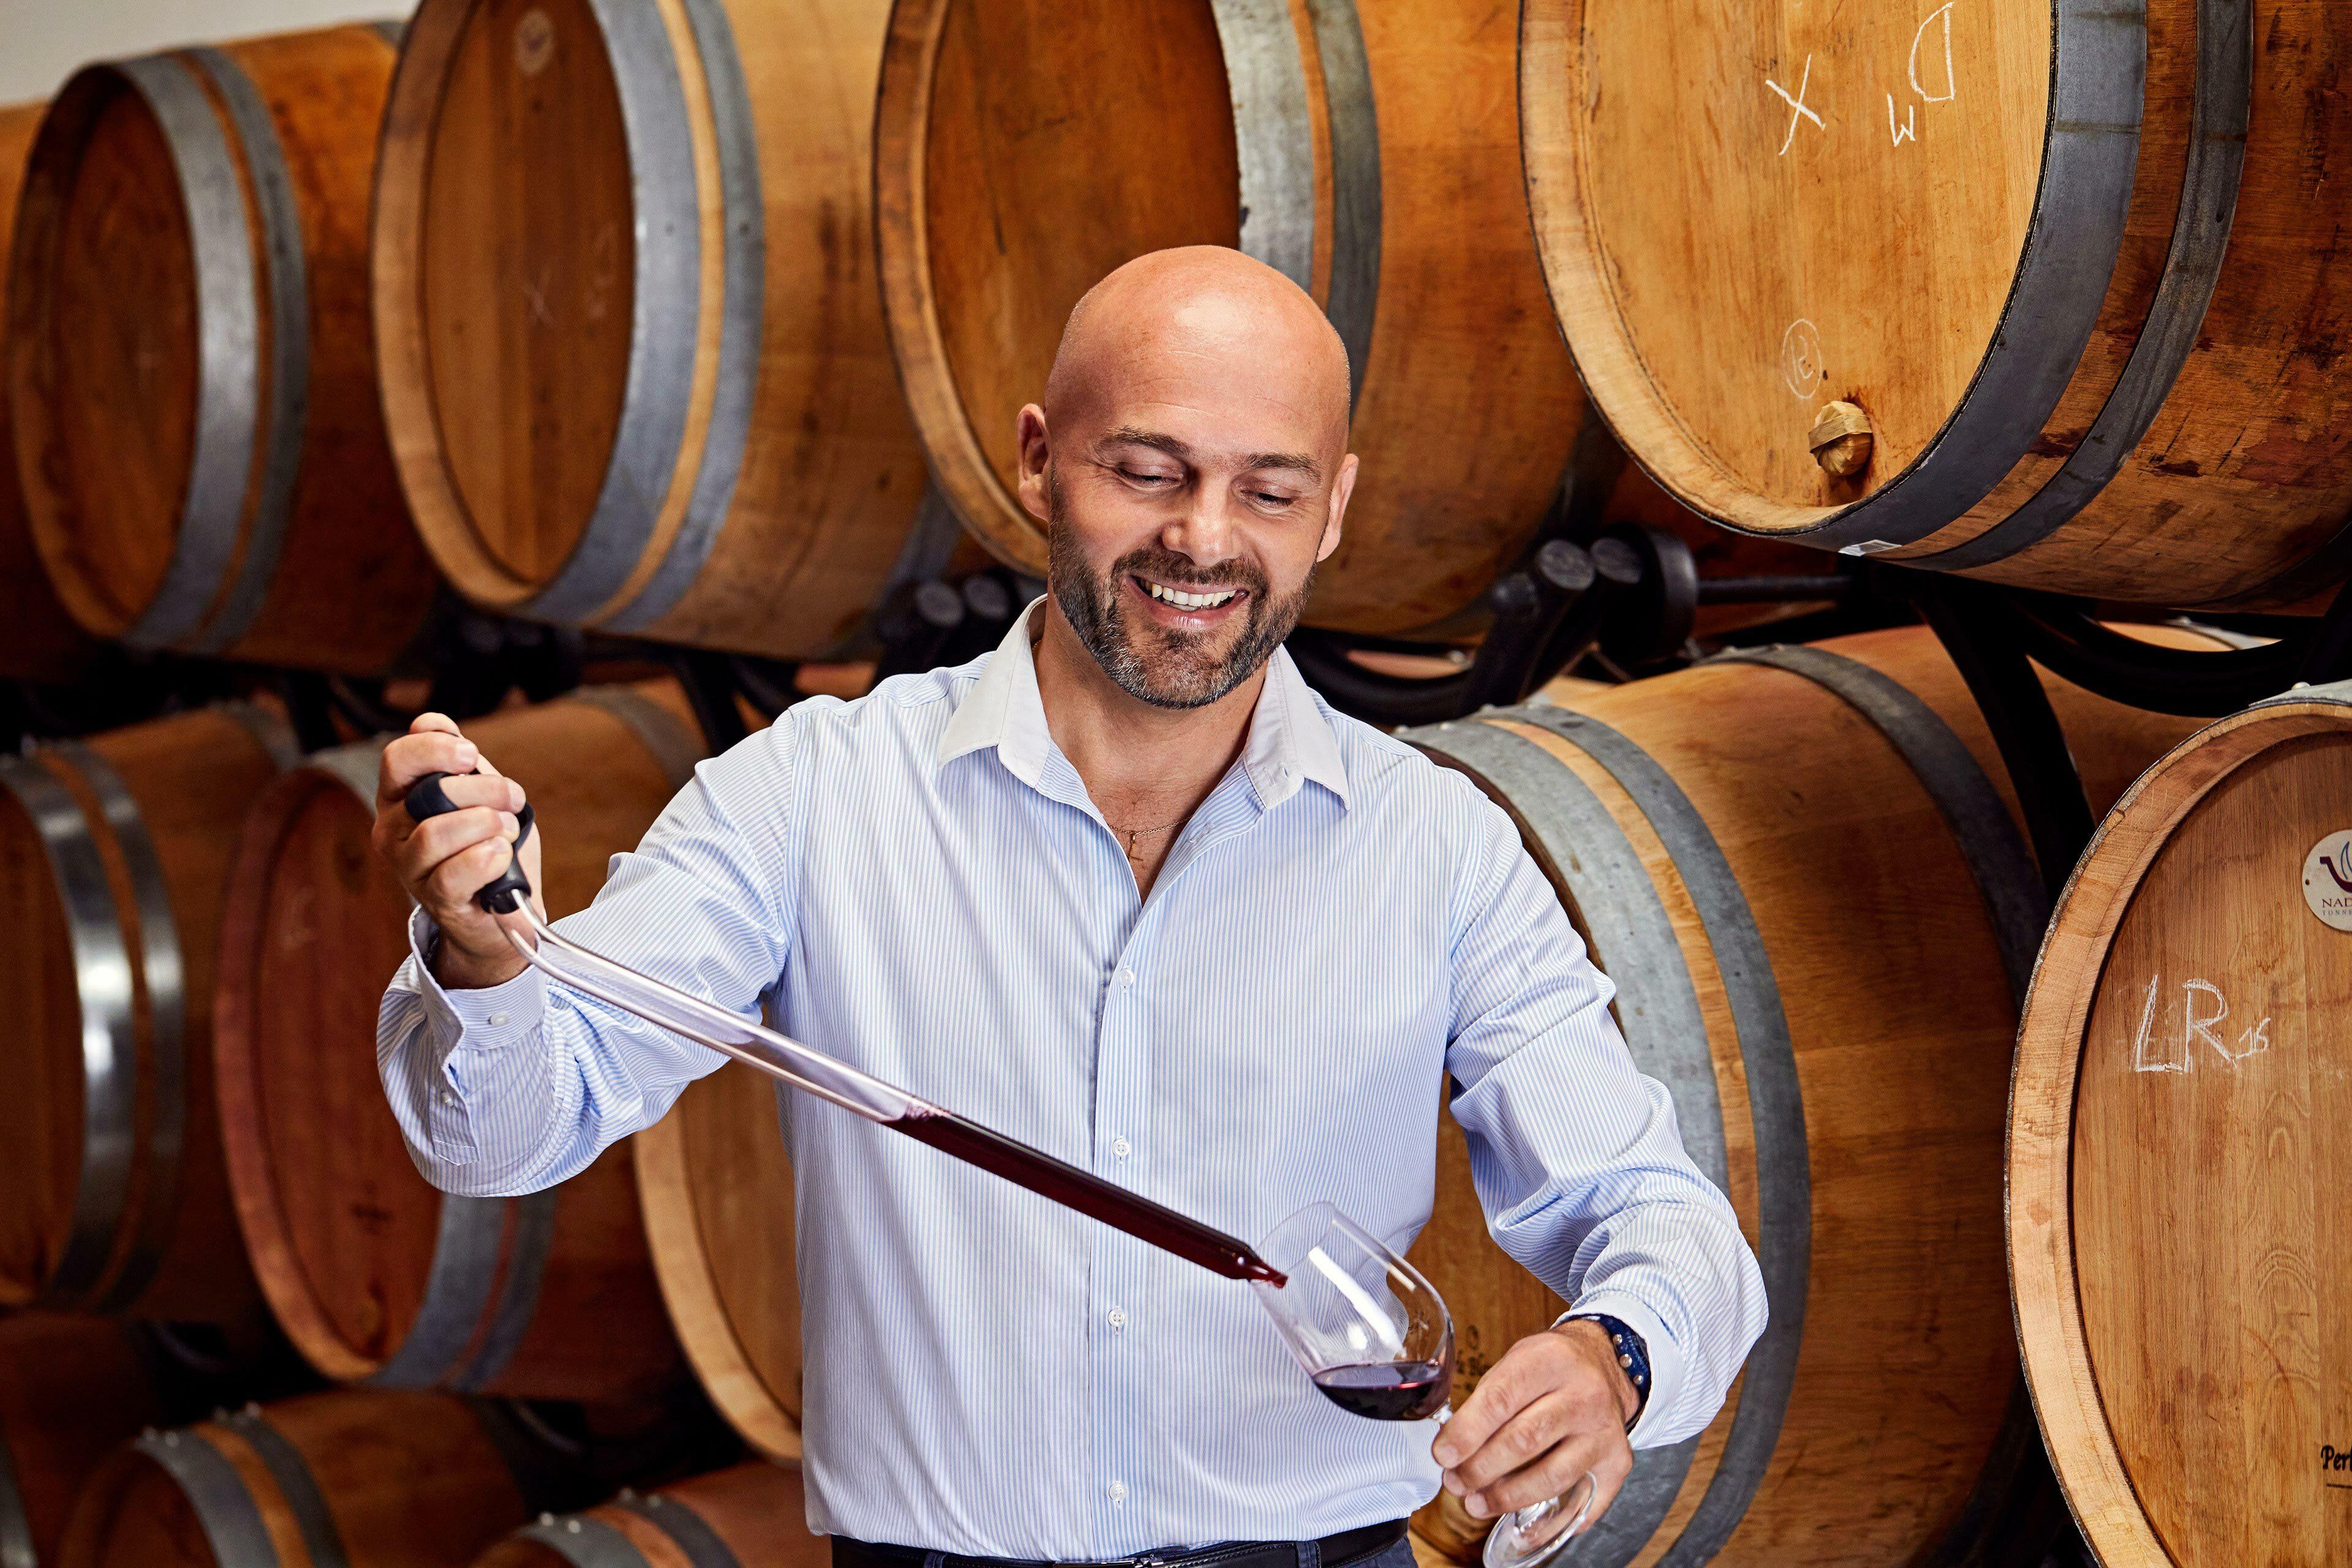 Richard Moran Viniv Wine Bordeaux Lifestyle 023